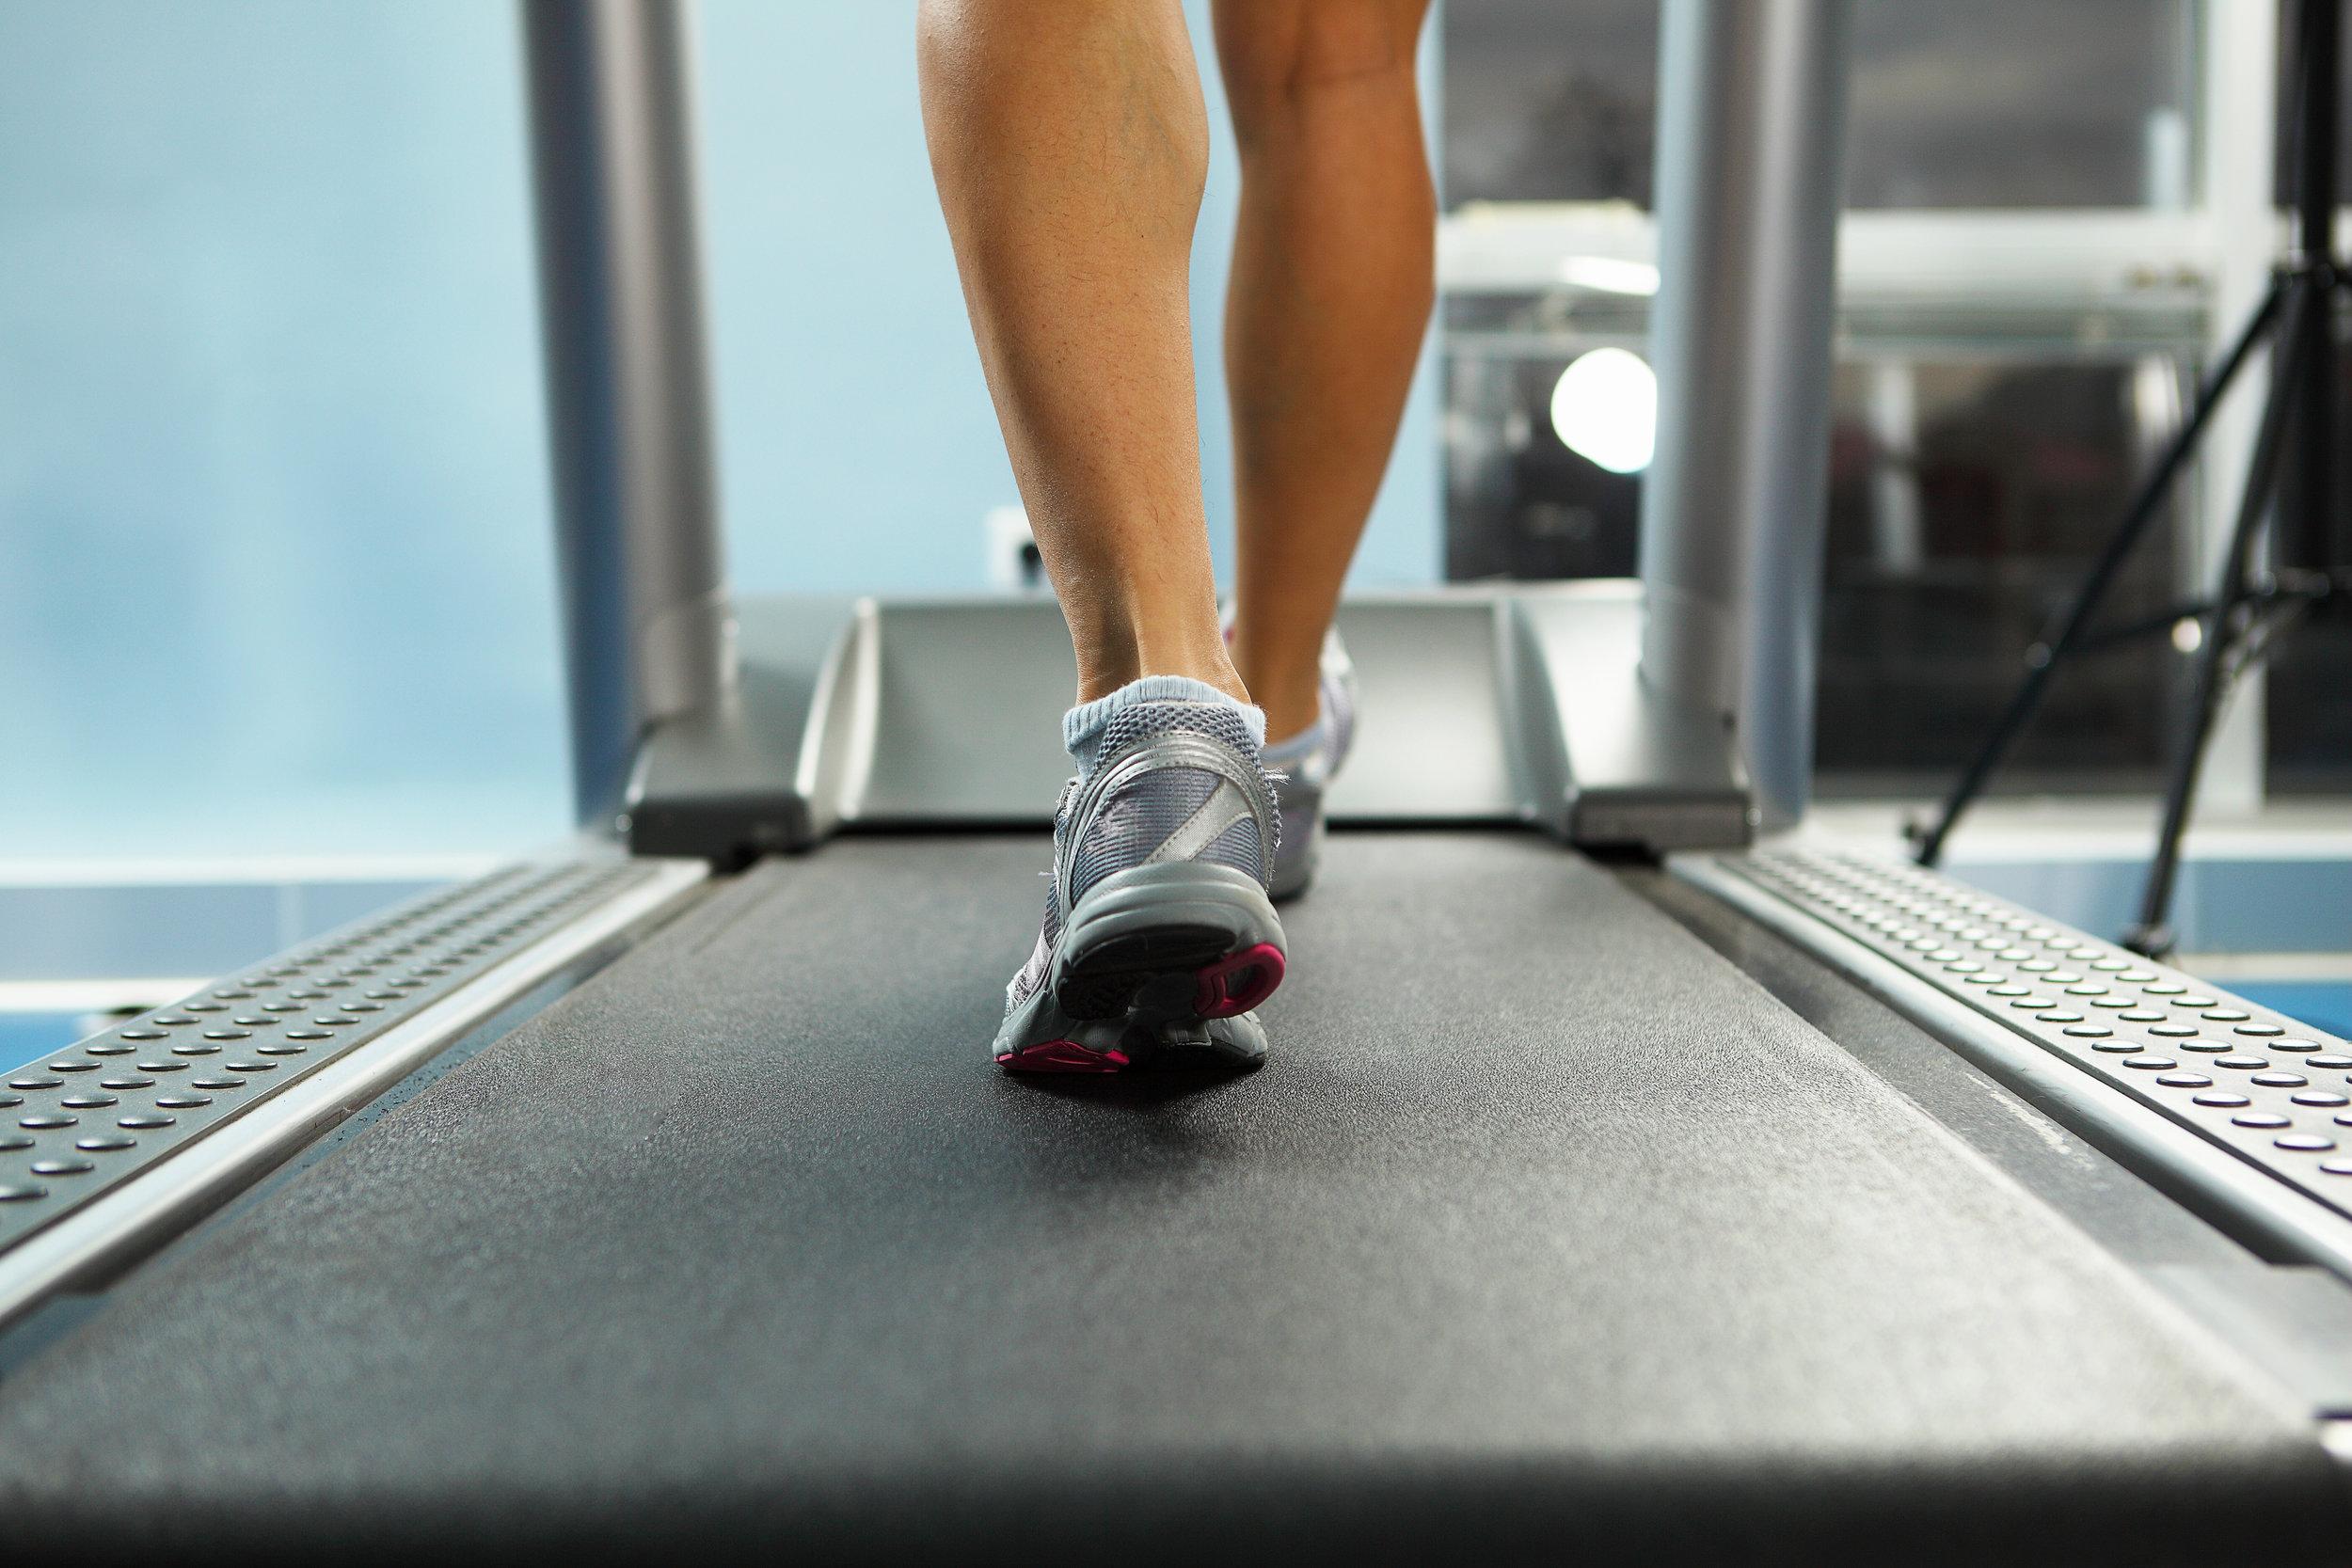 stockimage_treadmill.jpg